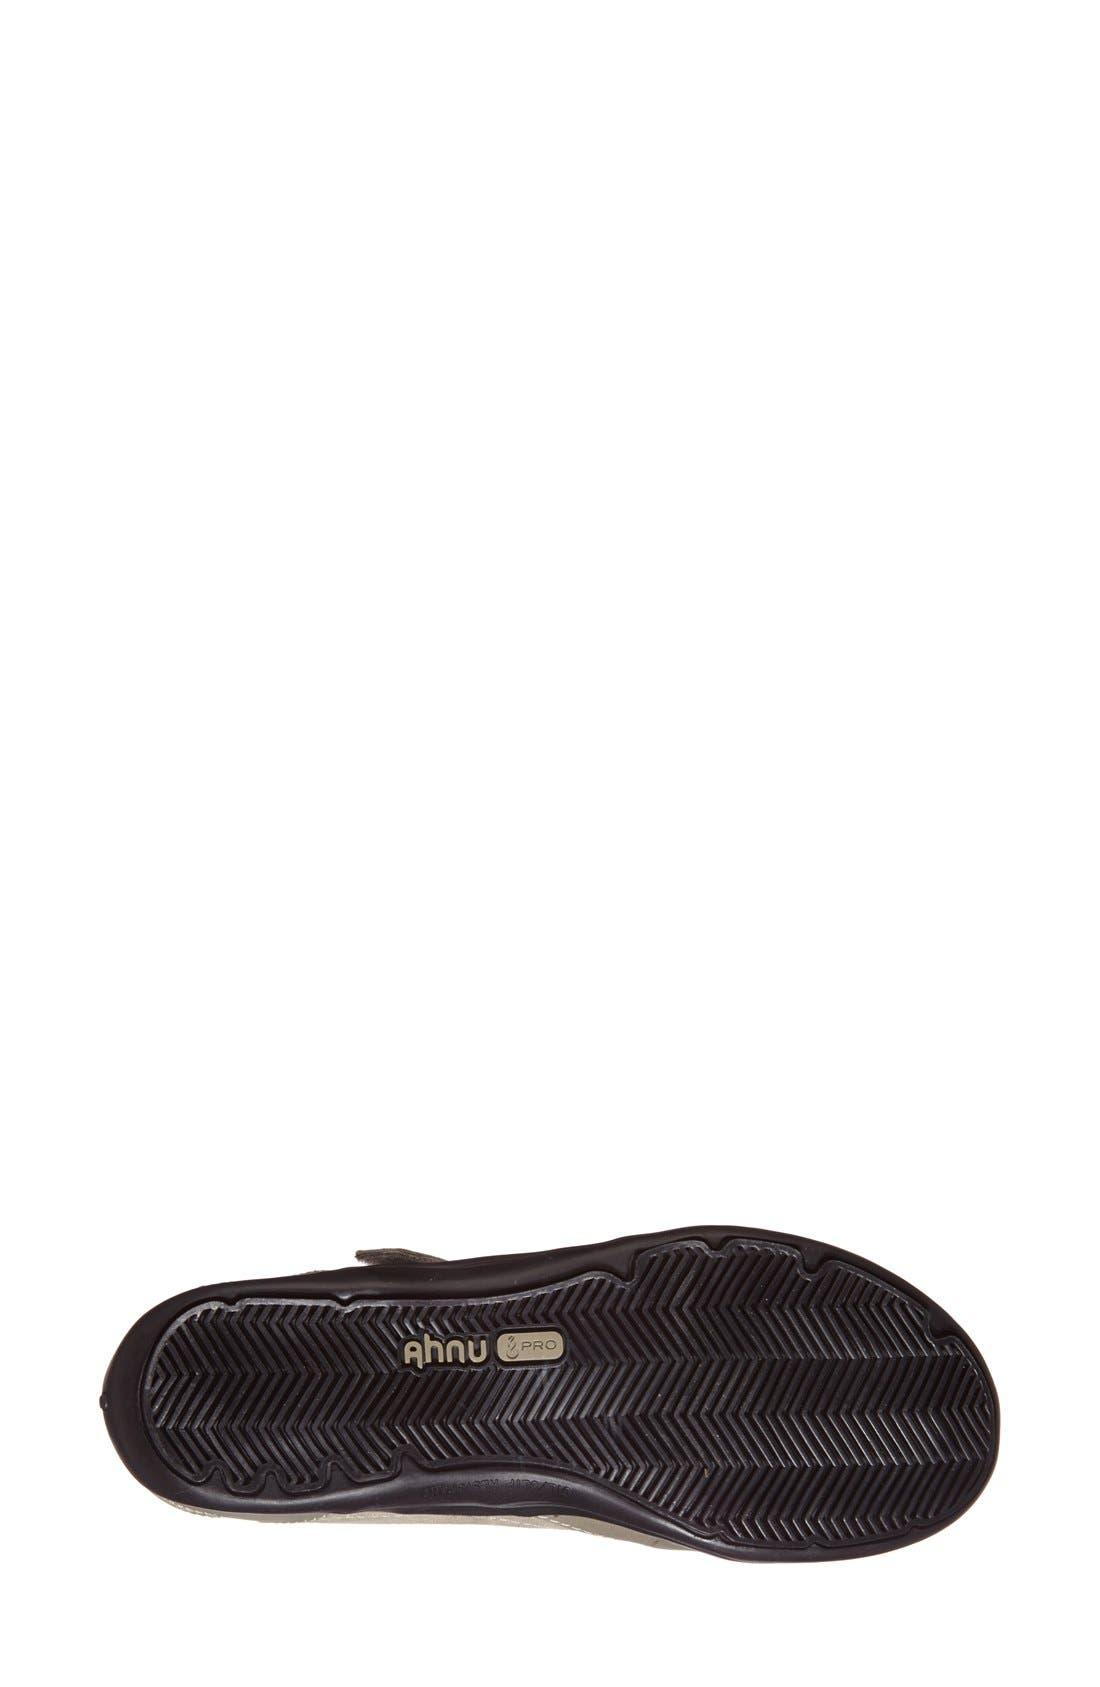 Alternate Image 4  - Ahnu 'Gracie Pro' Leather Flat (Women)